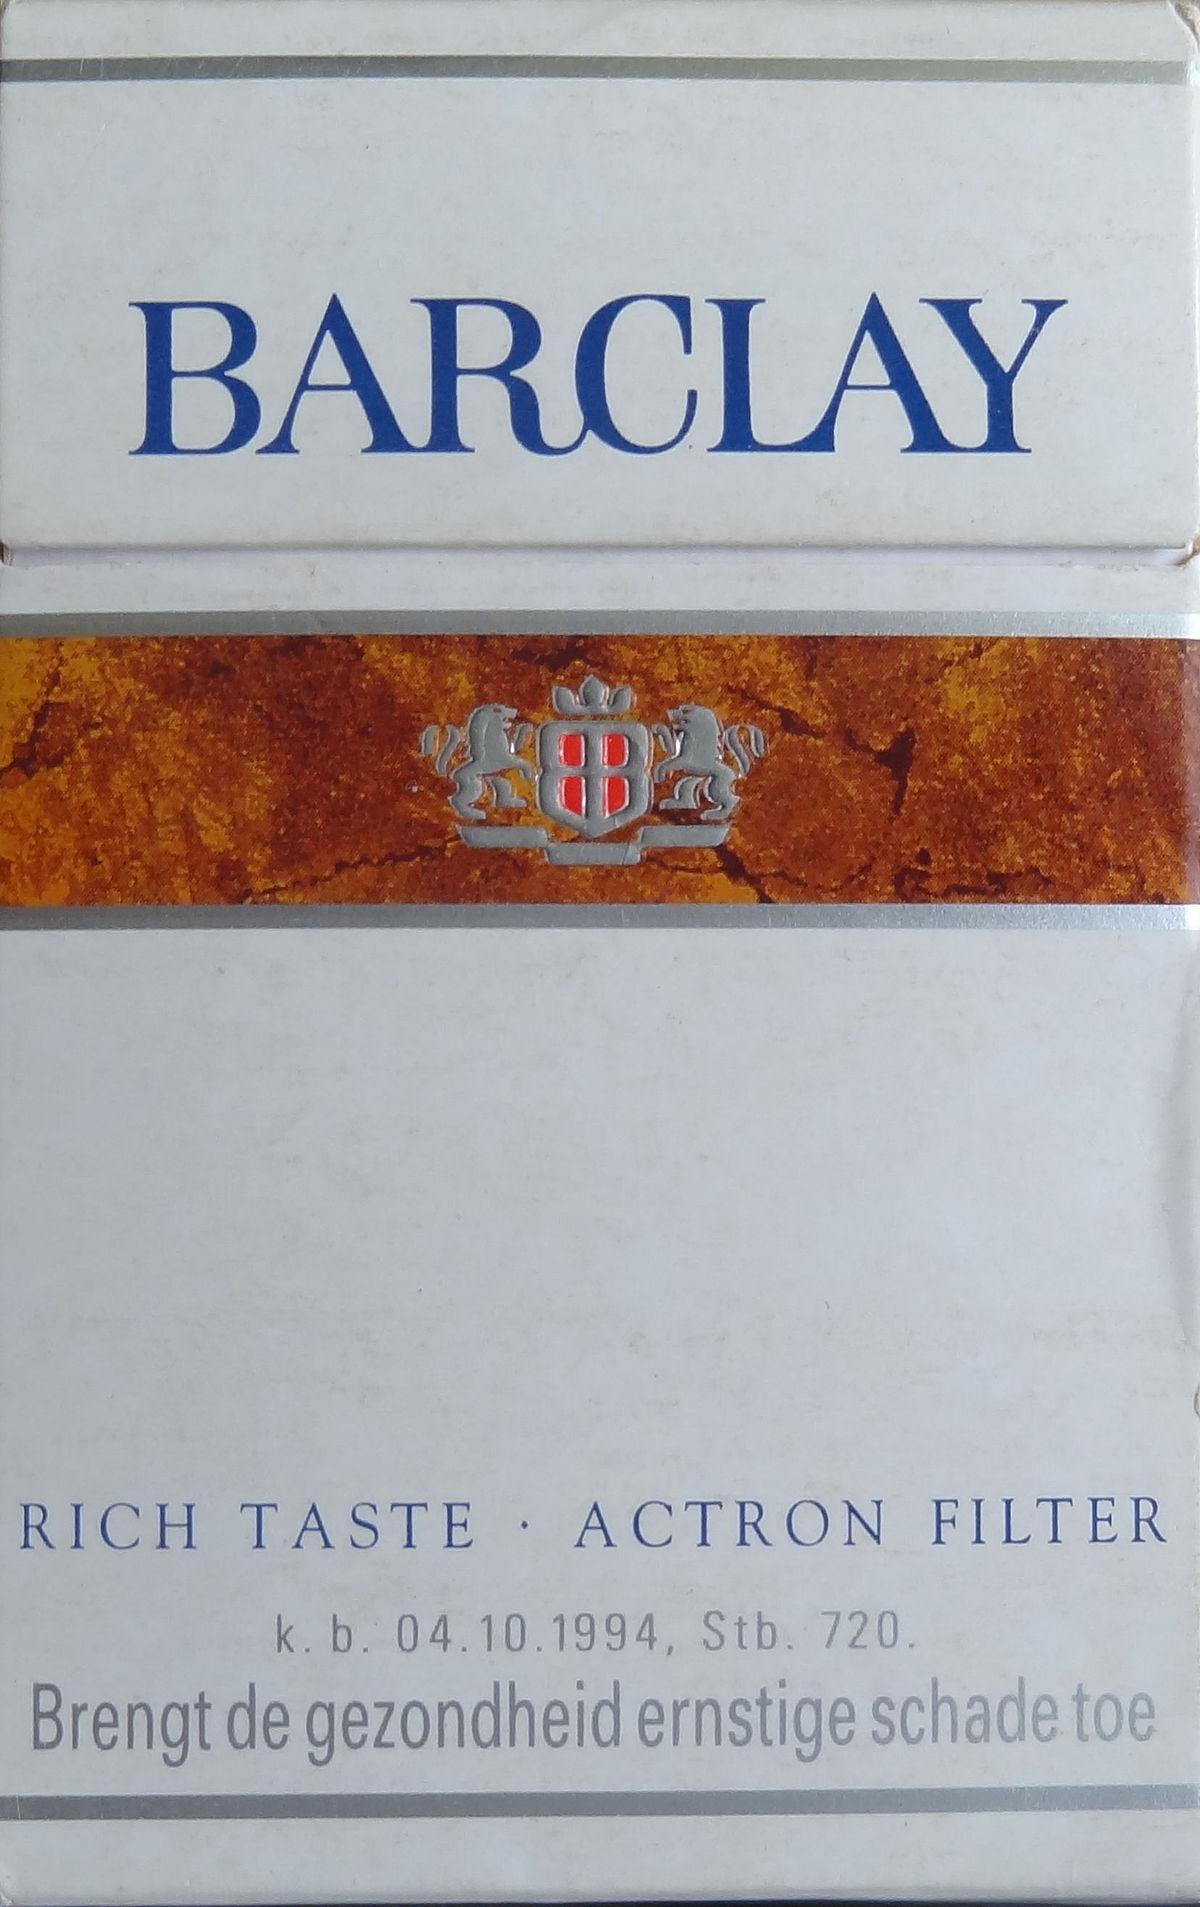 Barclay cigarette wikipedia for The barclay